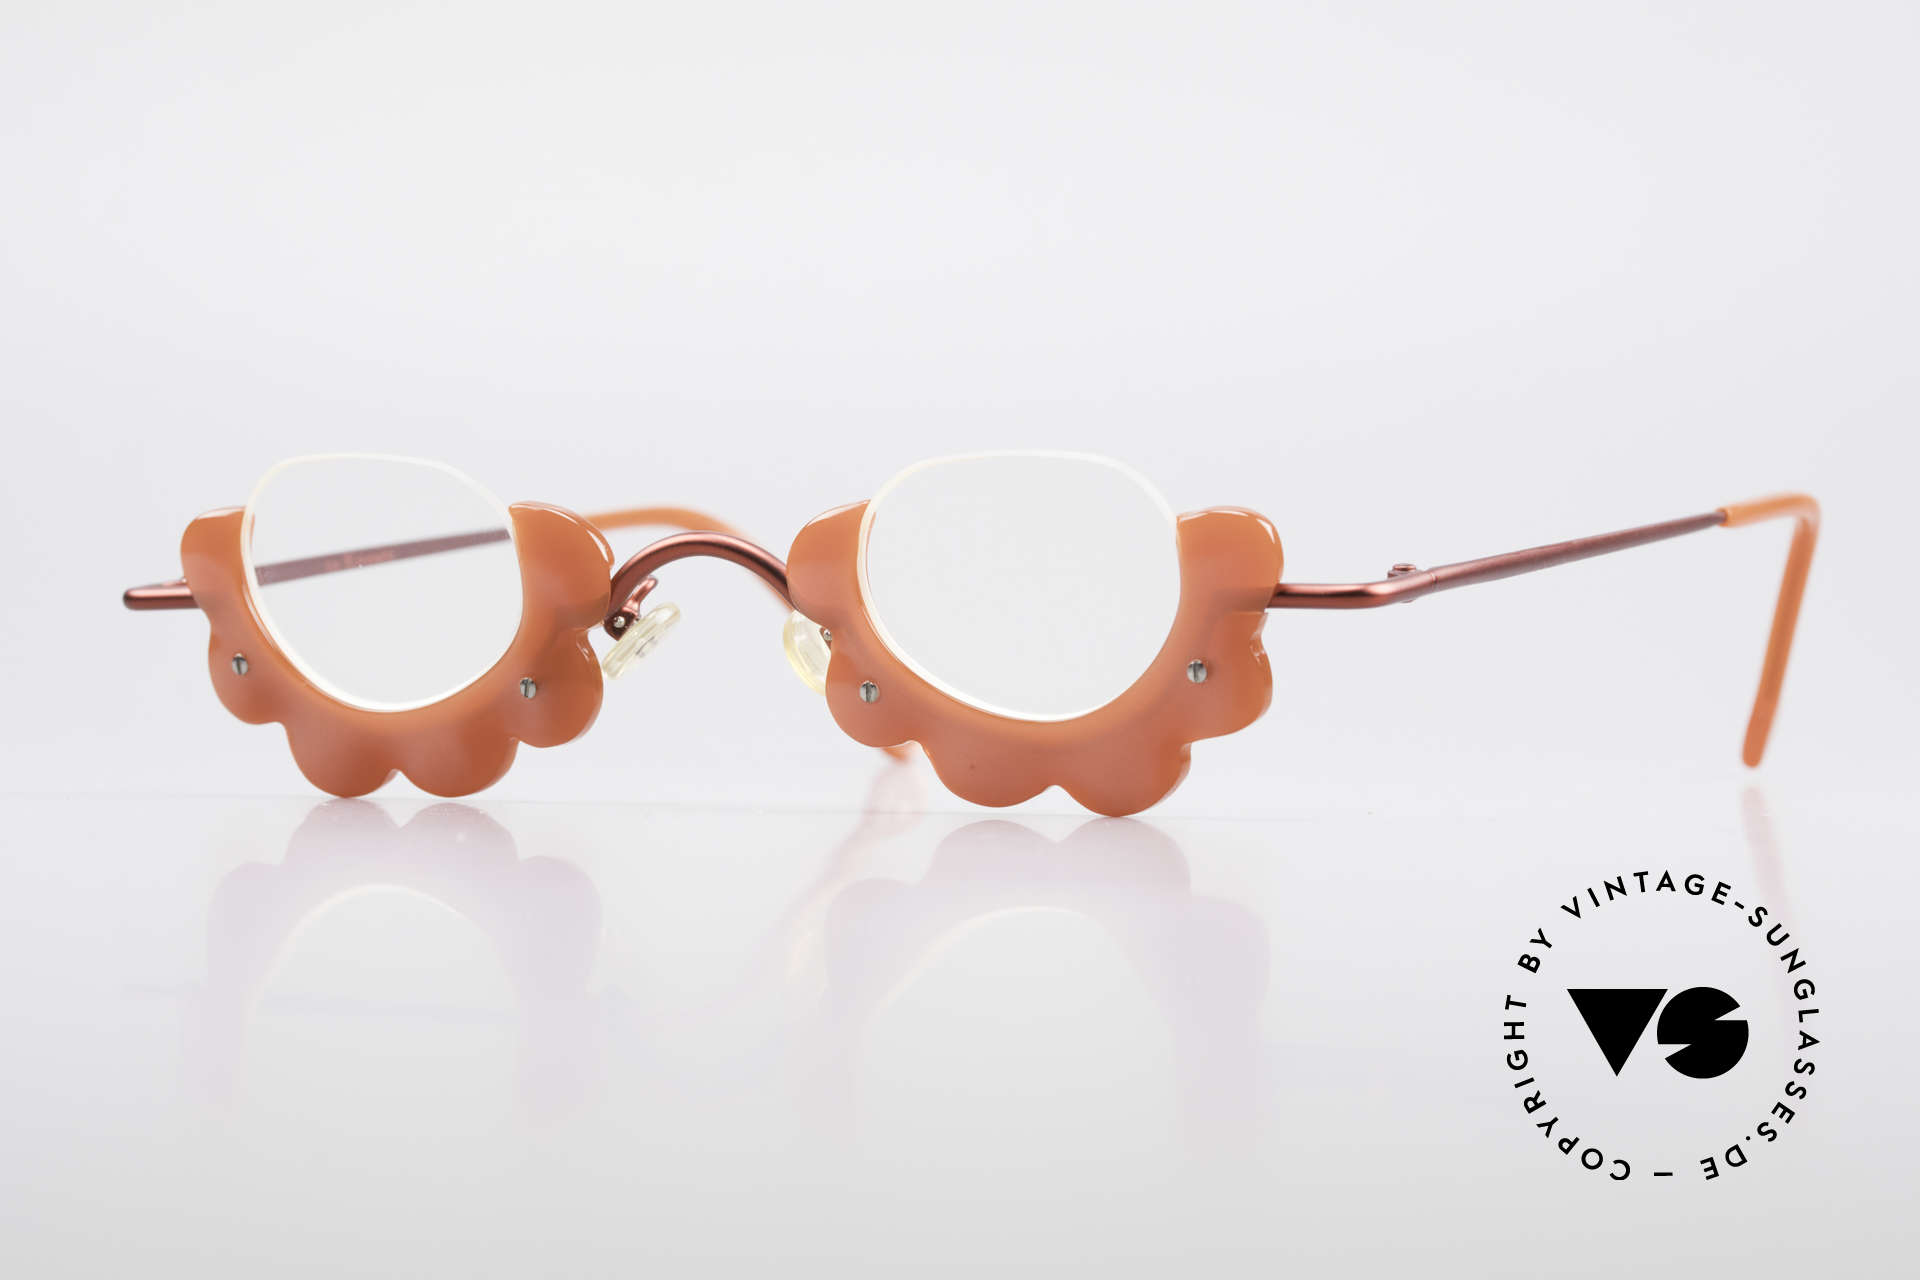 L.A. Eyeworks BUMBLE 487 Enchanting Ladies Eyeglasses, enchanting vintage ladies' glasses by L.A. EYEWORKS, Made for Women